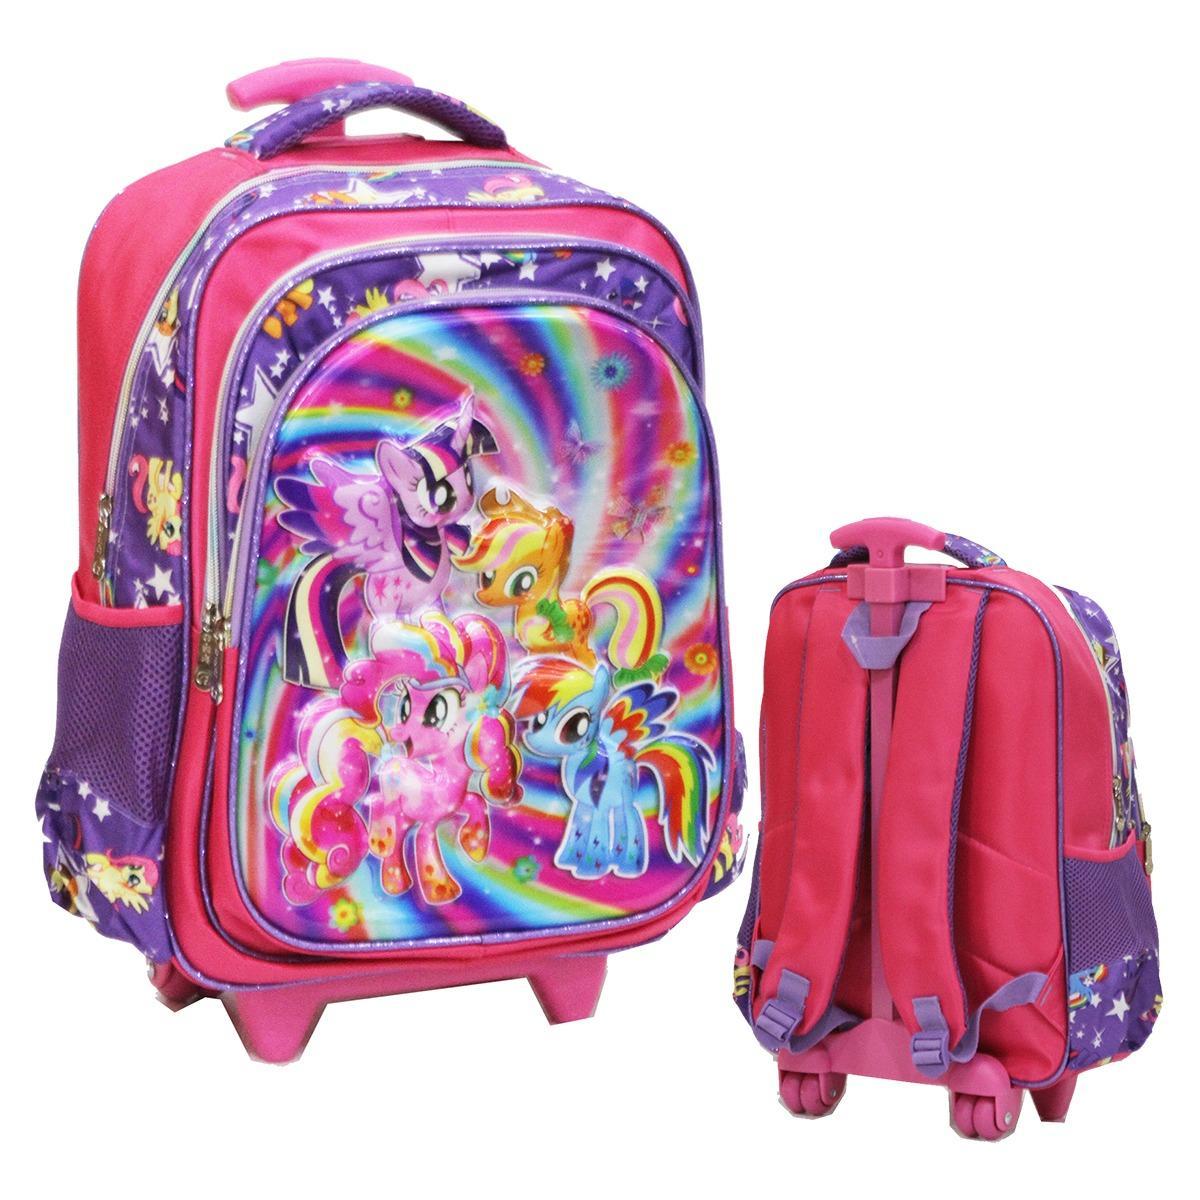 Onlan My Little Pony Flower 5D Timbul Hologram Tas Trolley Kantung Besar Resleting Rainbow IMPORT -